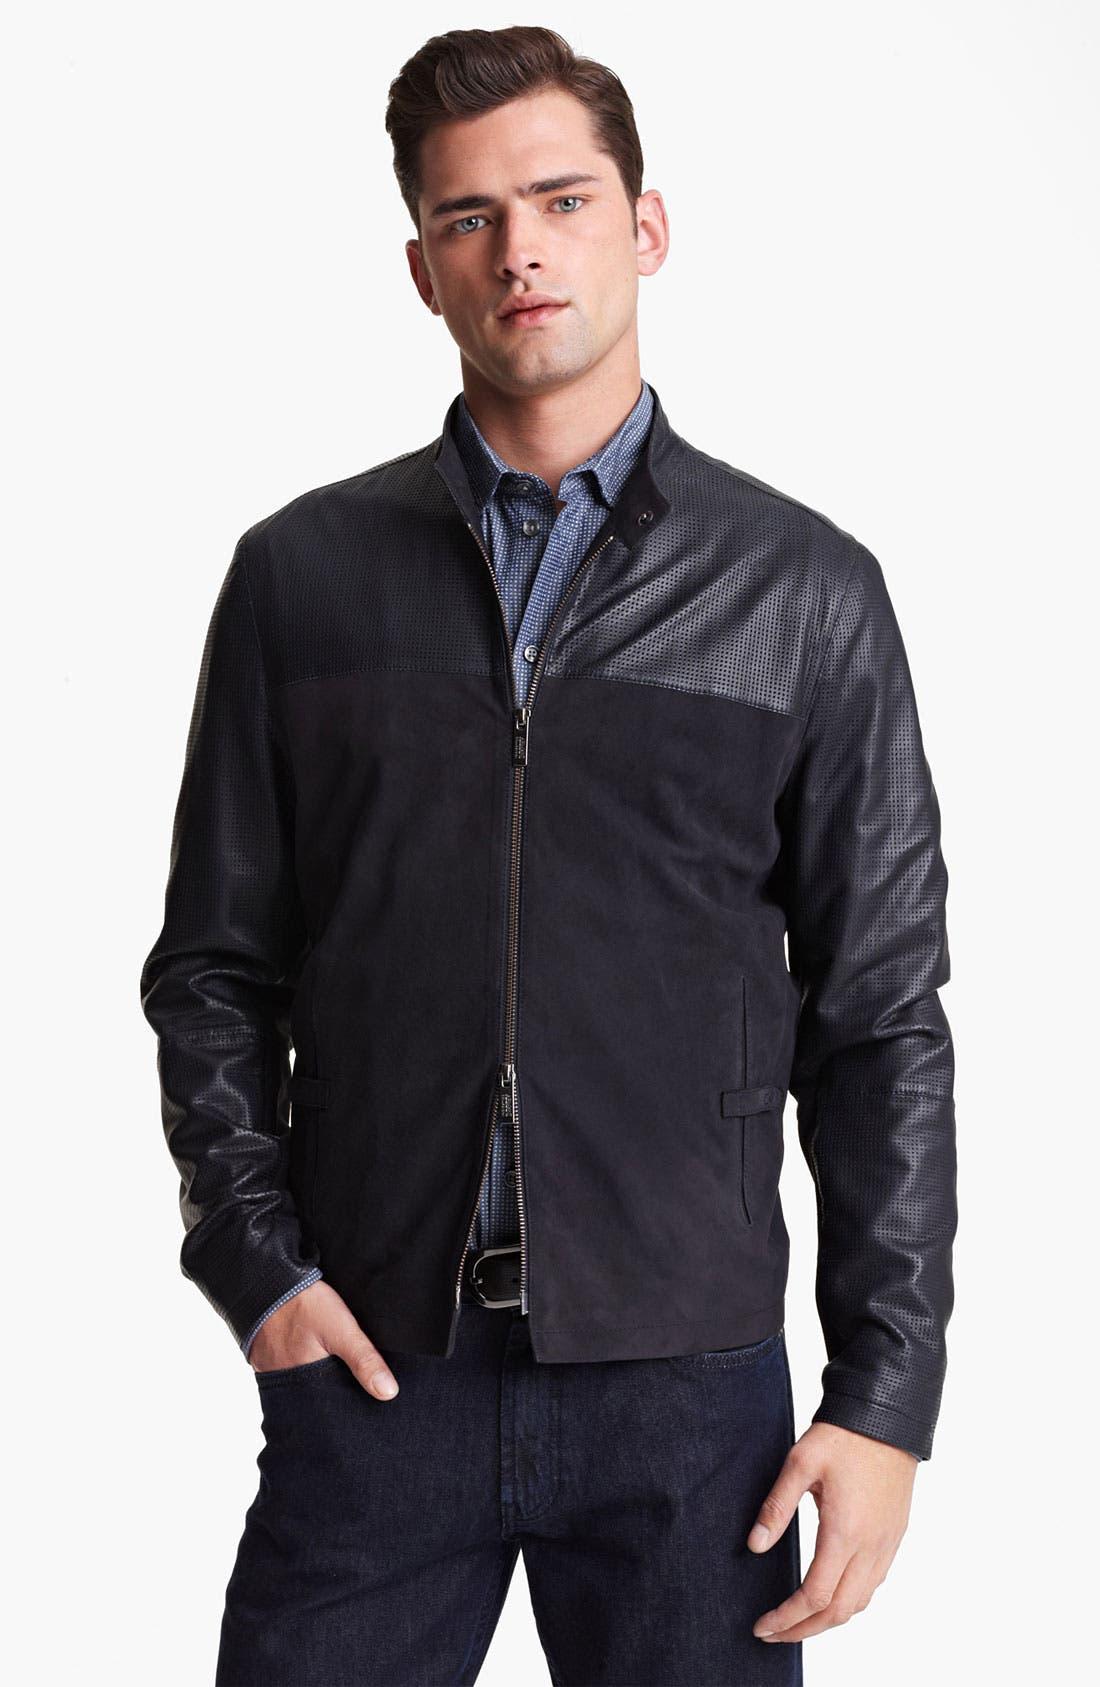 Main Image - Armani Collezioni Perforated Lambskin Leather Jacket